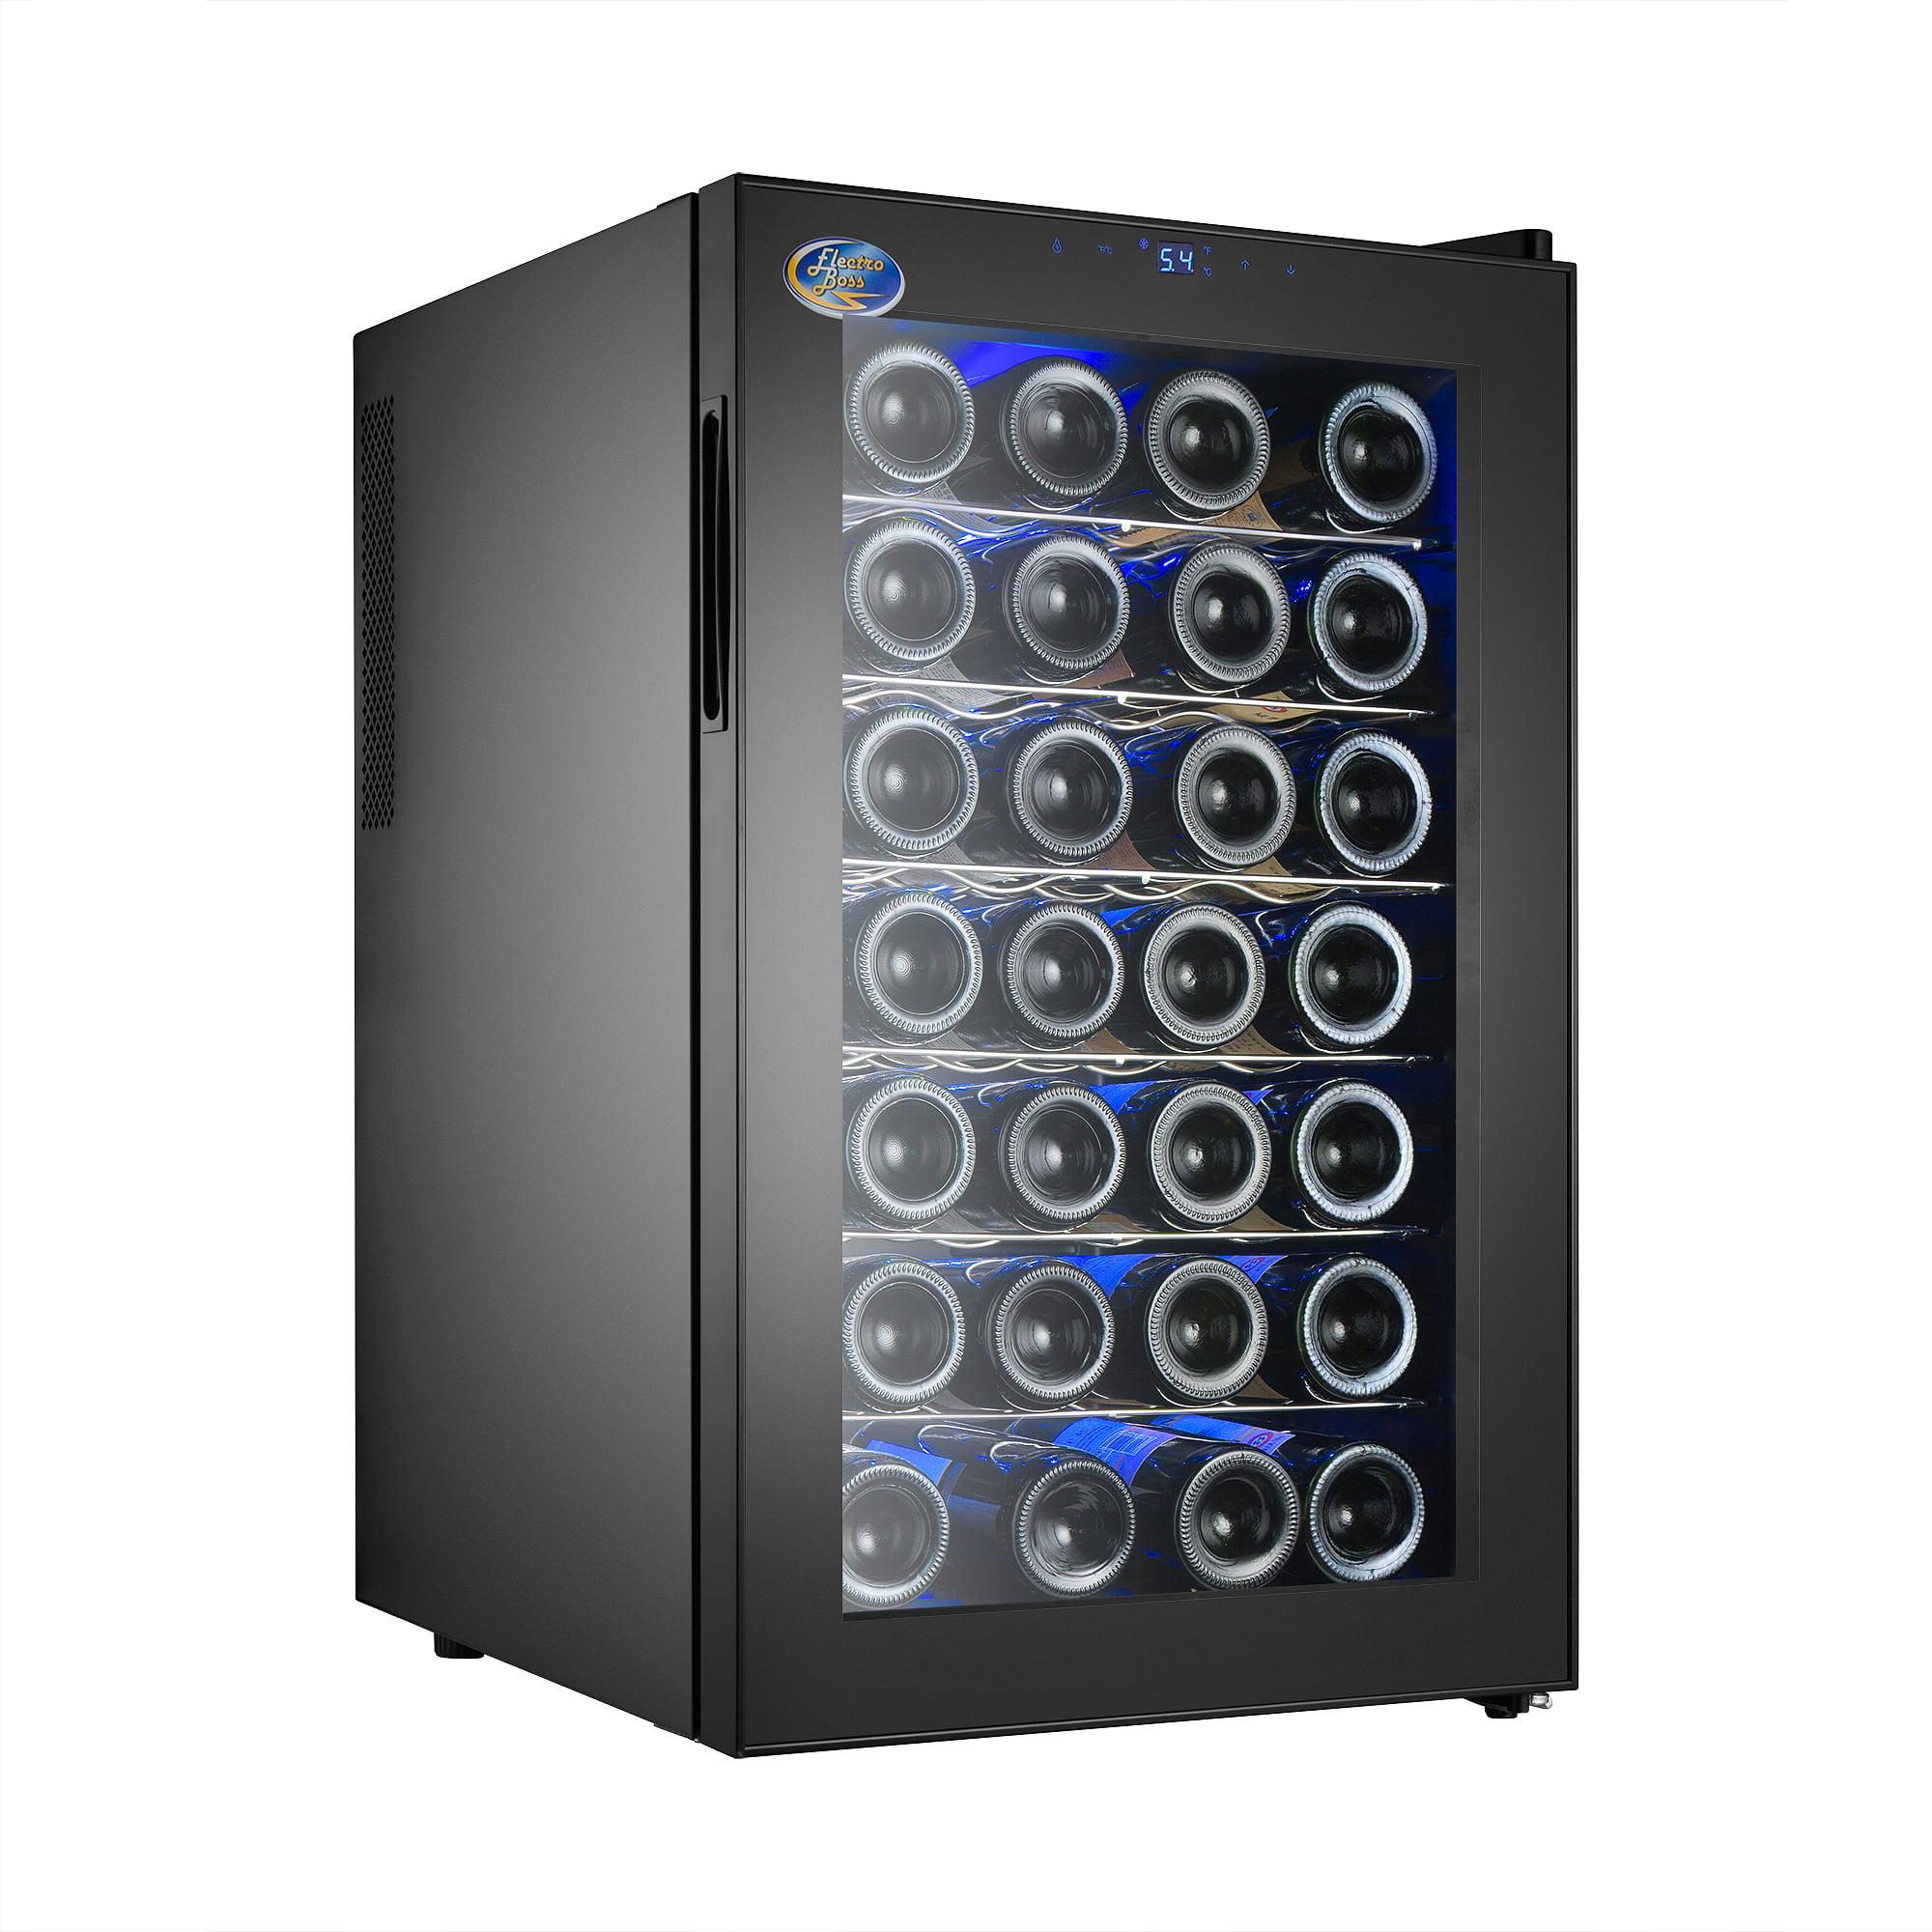 Electro Boss 28 Bottle Thermoelectic Wine Cooler Black | Beverage Refrigerator